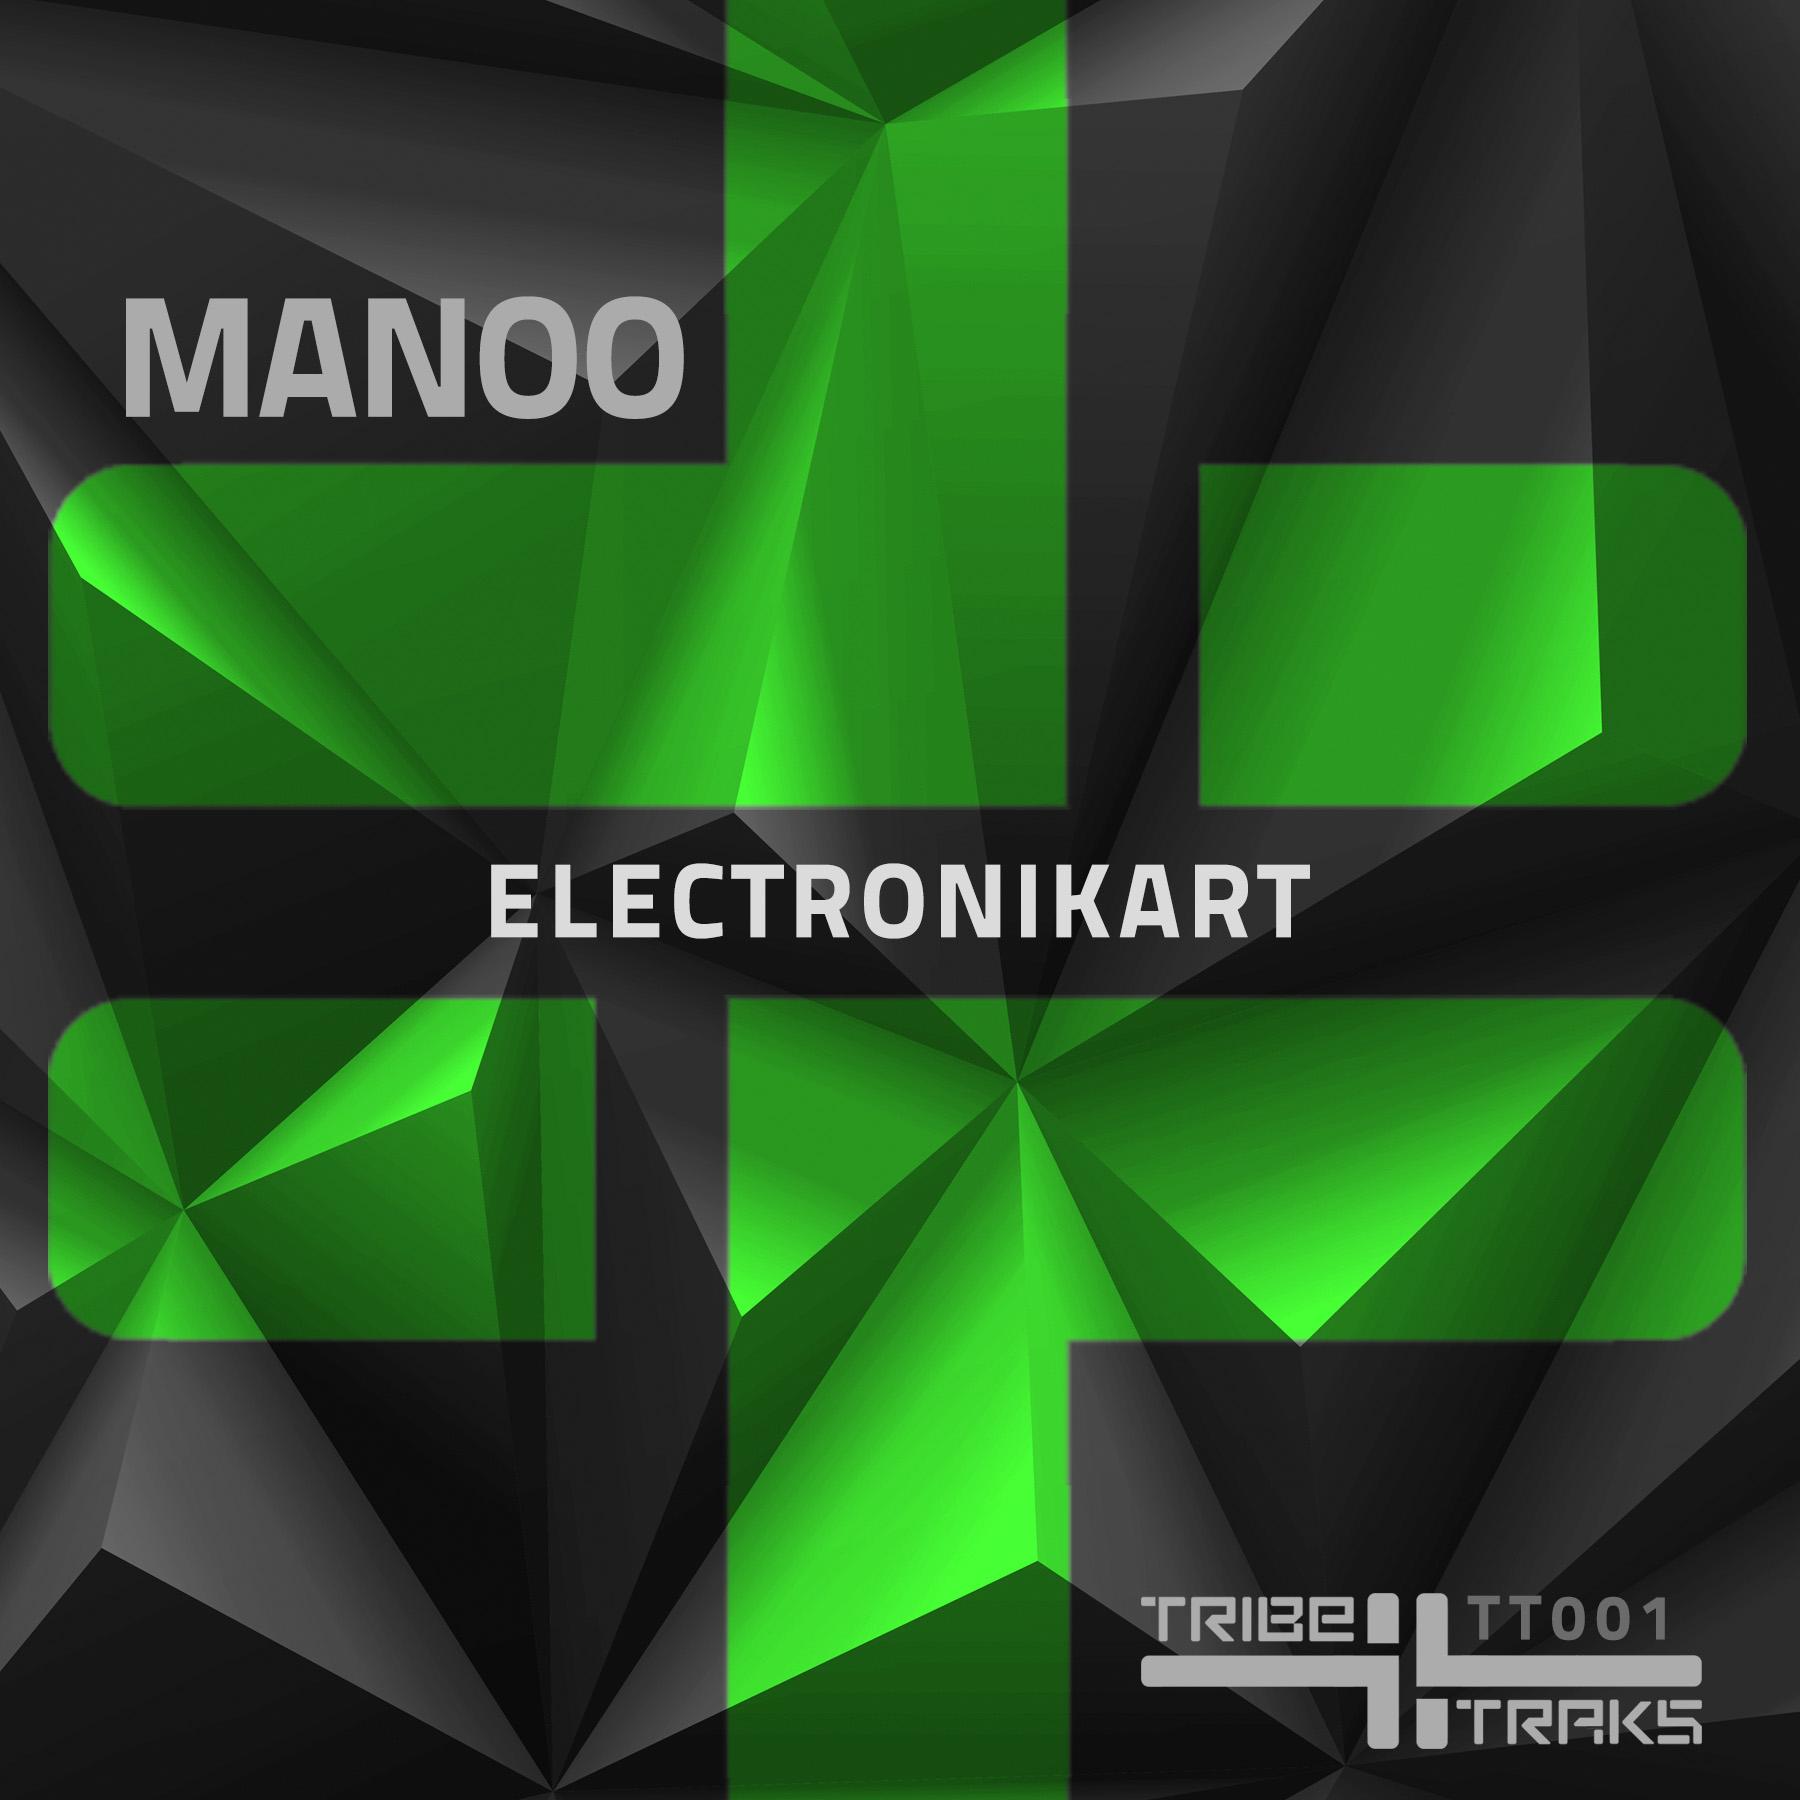 Electronikart Manoo